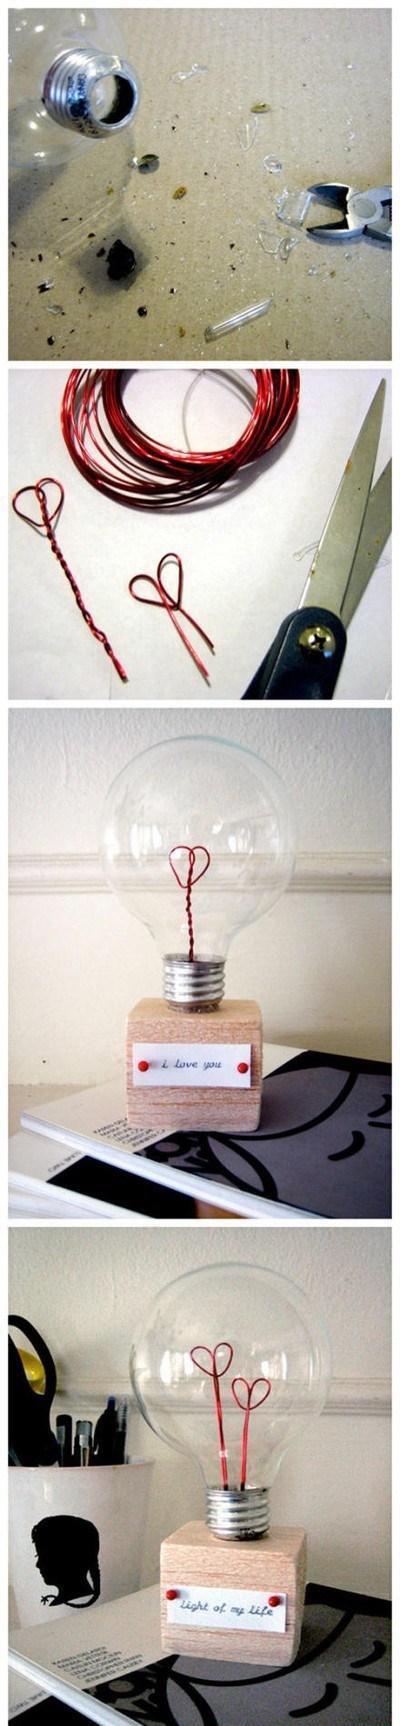 Super pomysł na ozdobę do pokoju :)